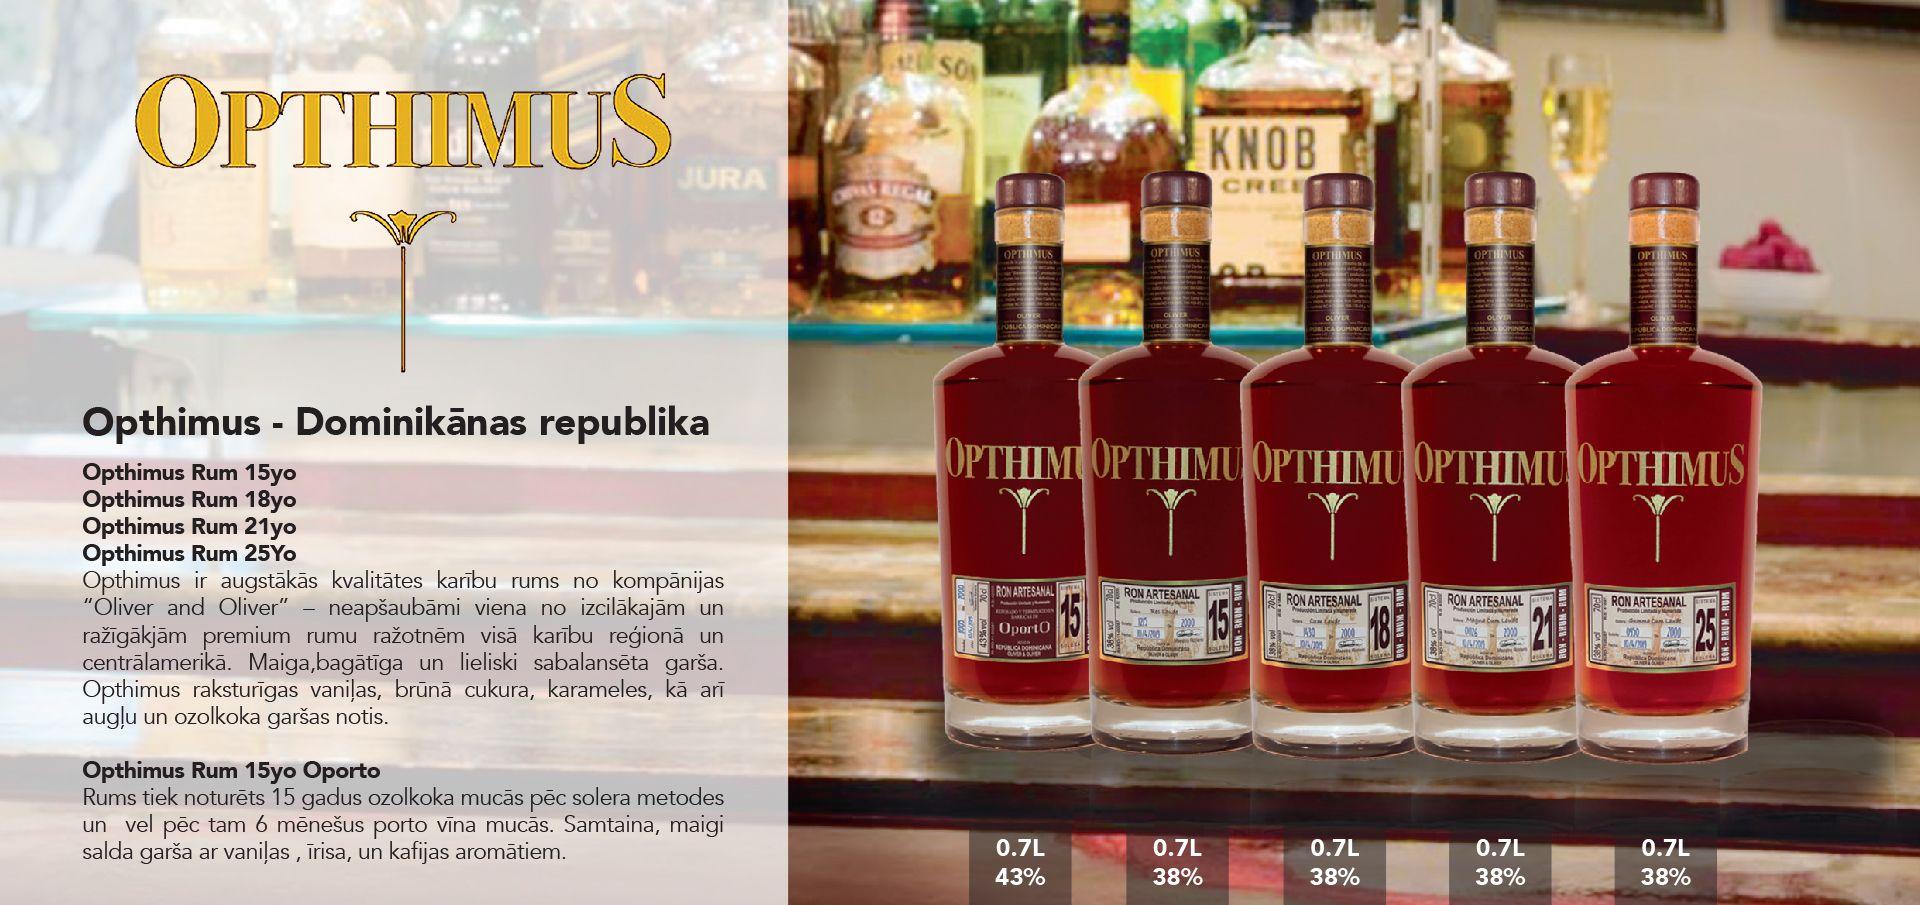 Opthimus Rum - Dominikānas republika